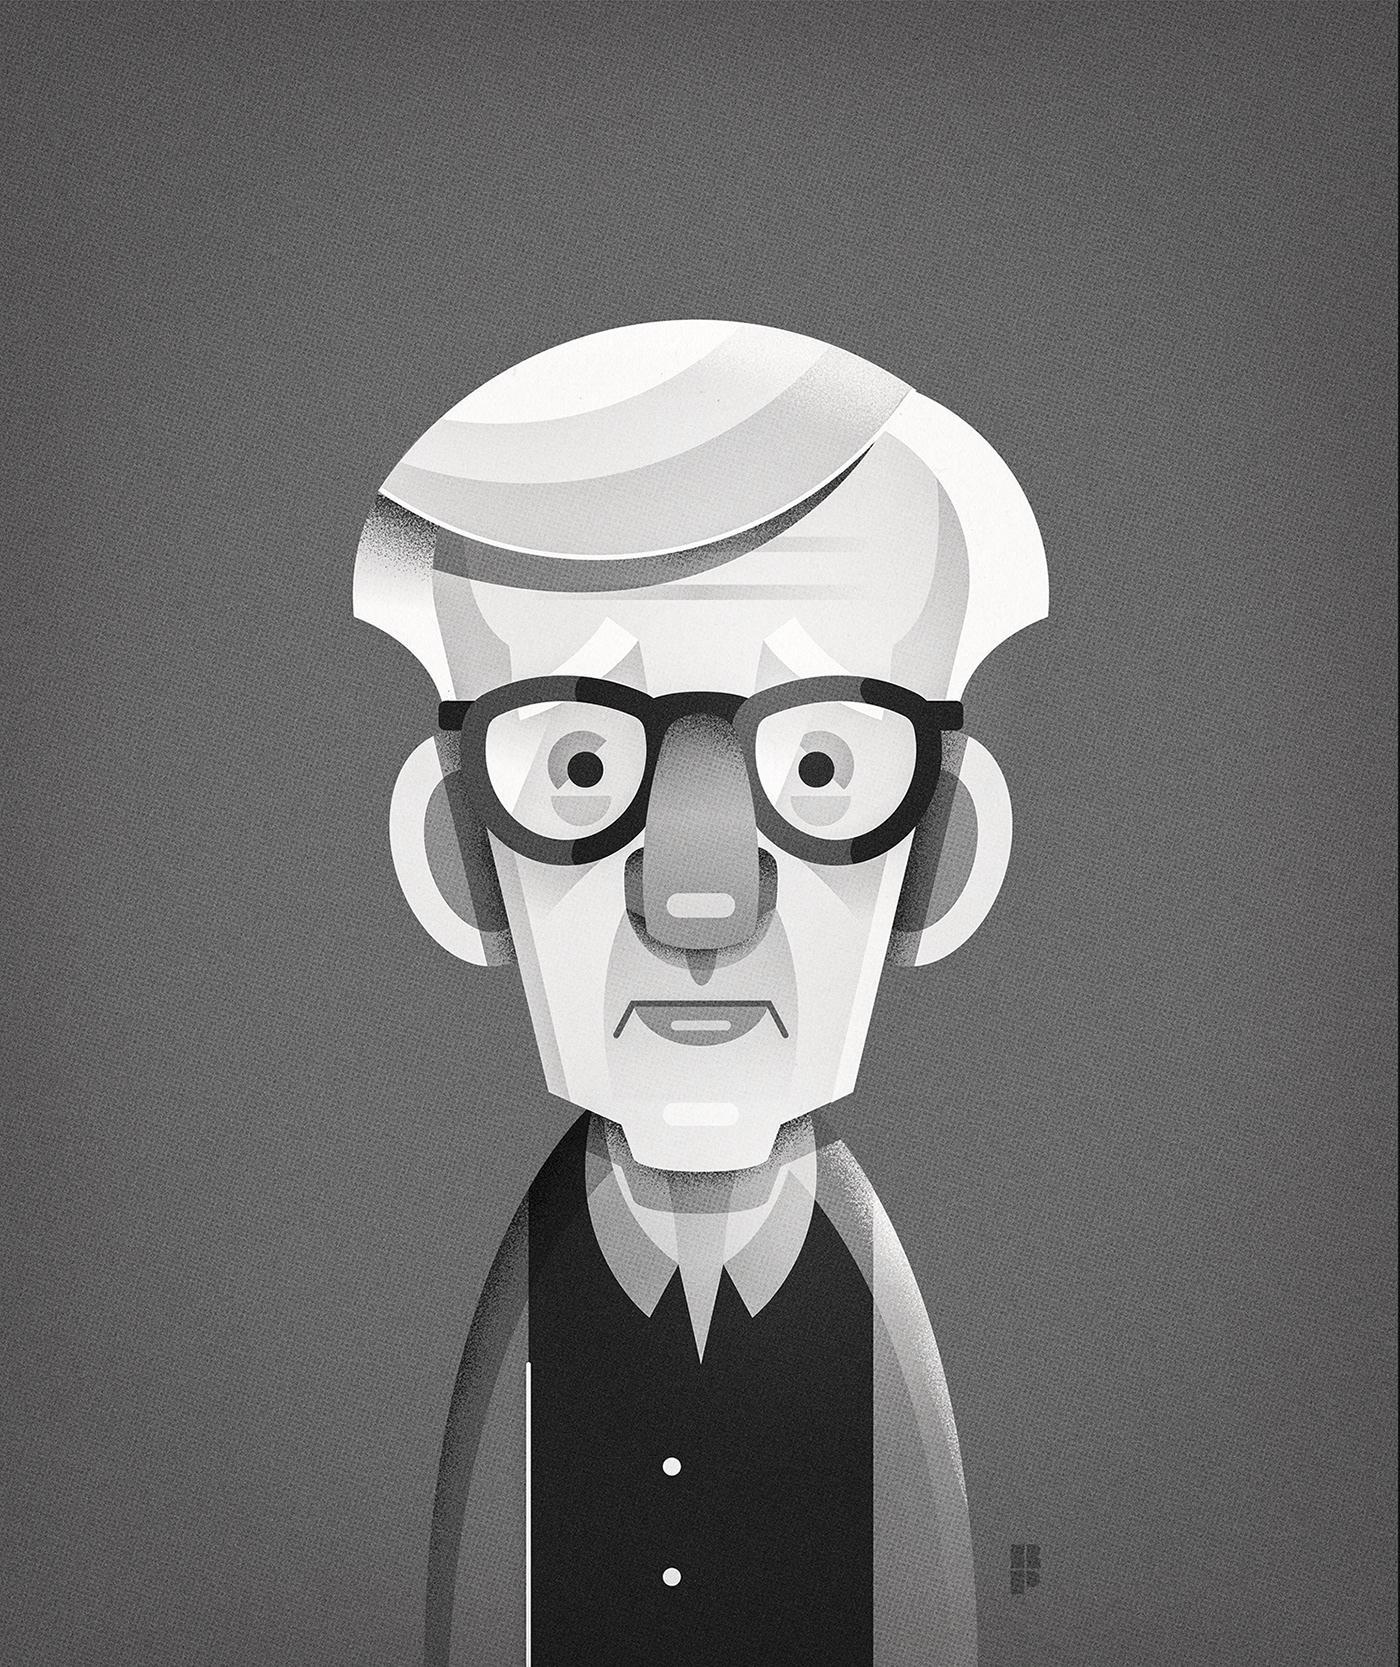 actors caricaturas famosos famous Illustrator portraits vector